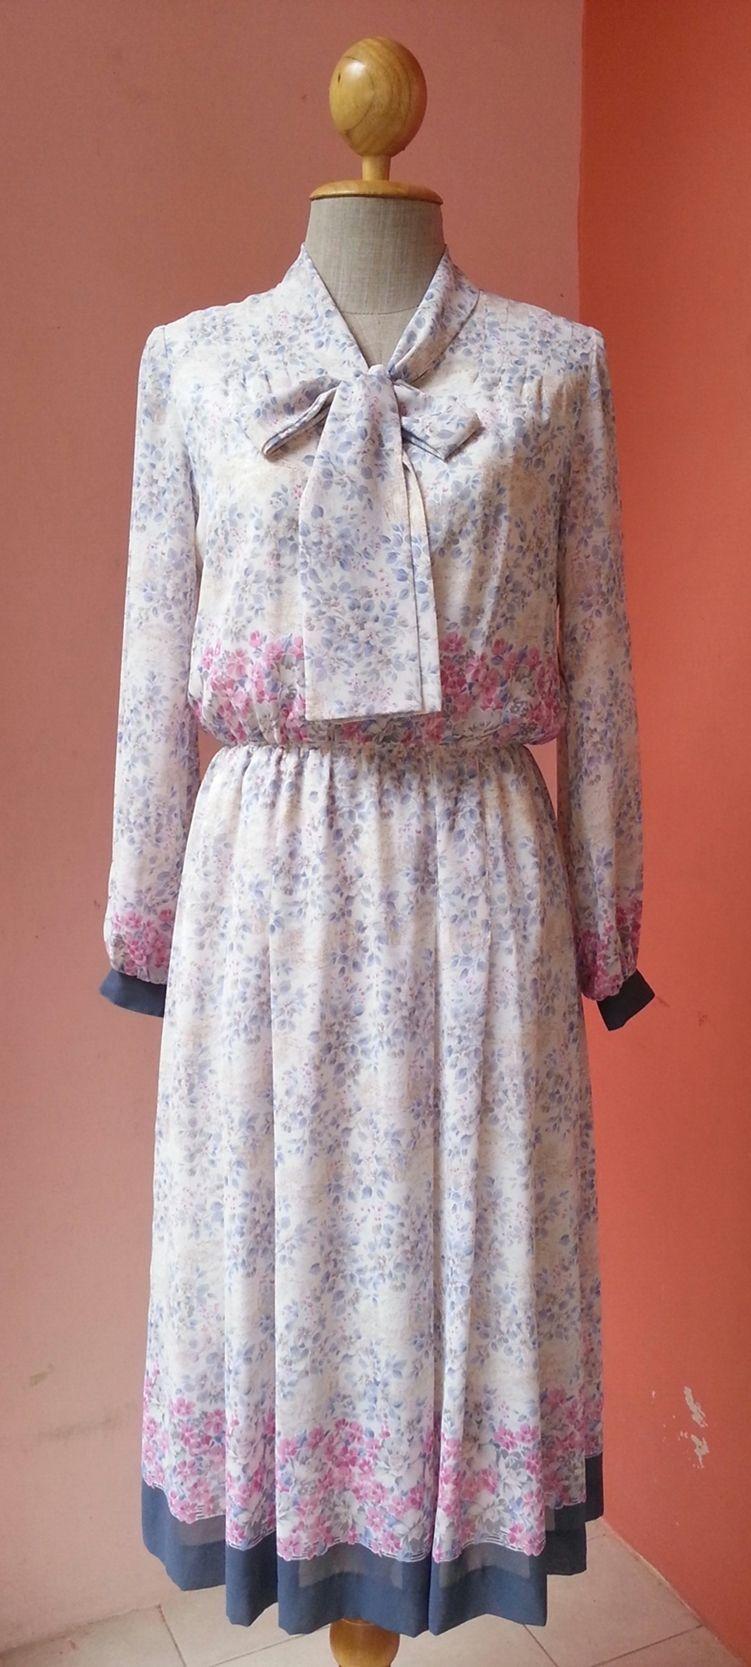 Floral dress women s summer dress vintage day dress retro dress